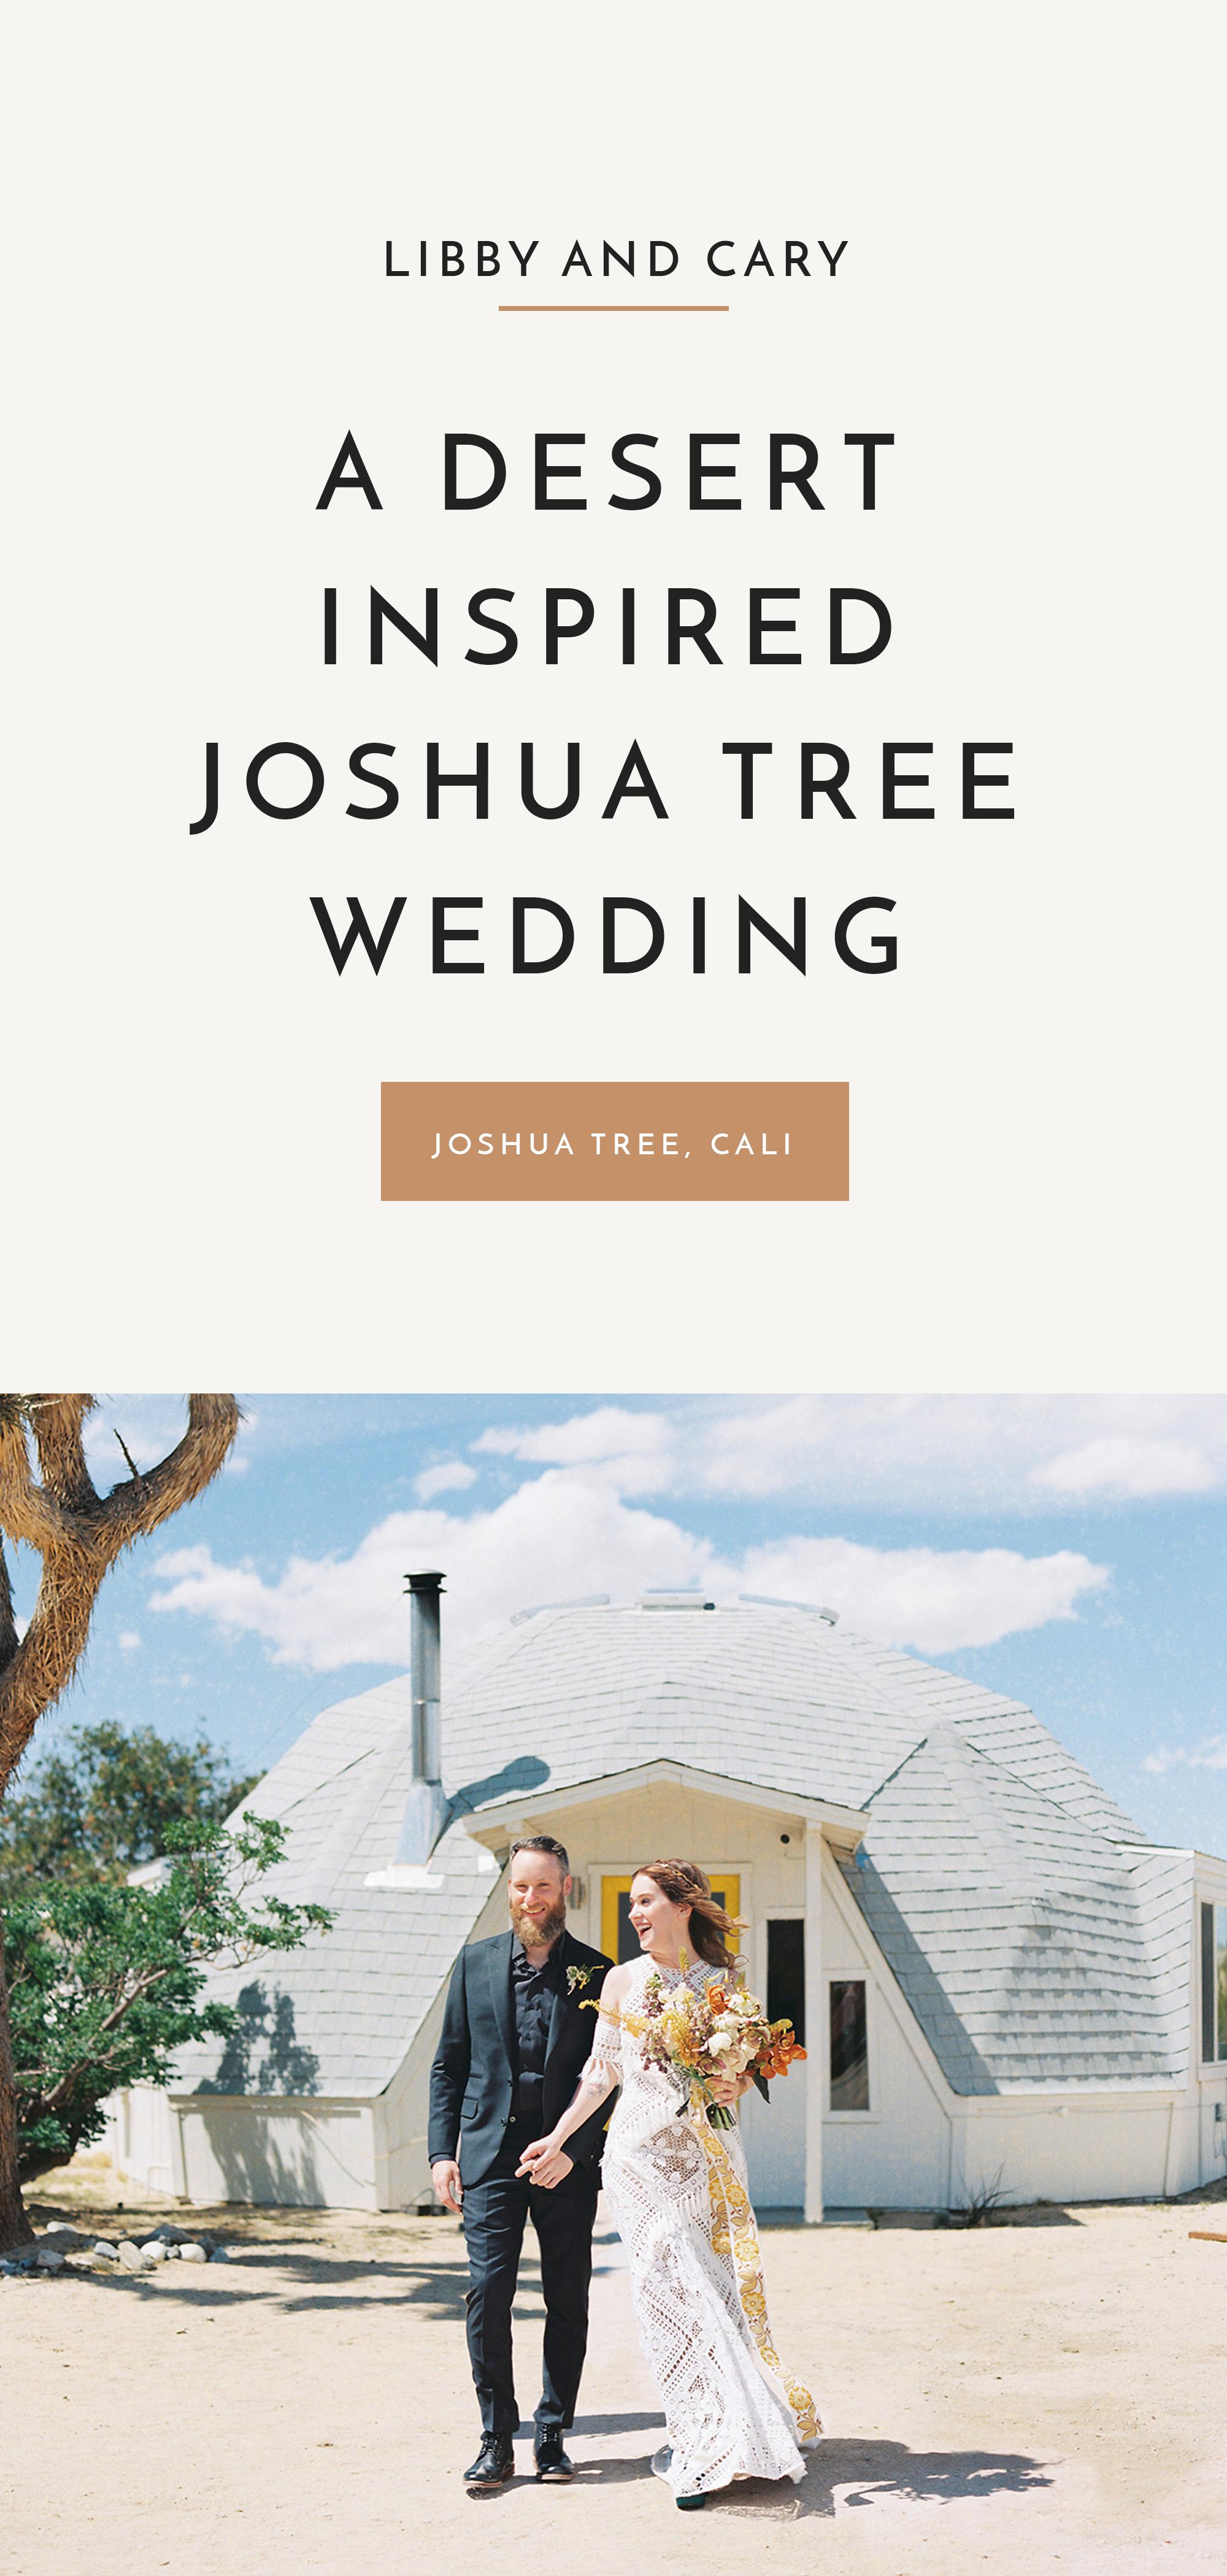 Atlanta Wedding Photographer California Wedding Joshua Tree Wedding Cactus Inspired Desert Wedding Botanical Wedding Boho Wedding Four Corners Photography